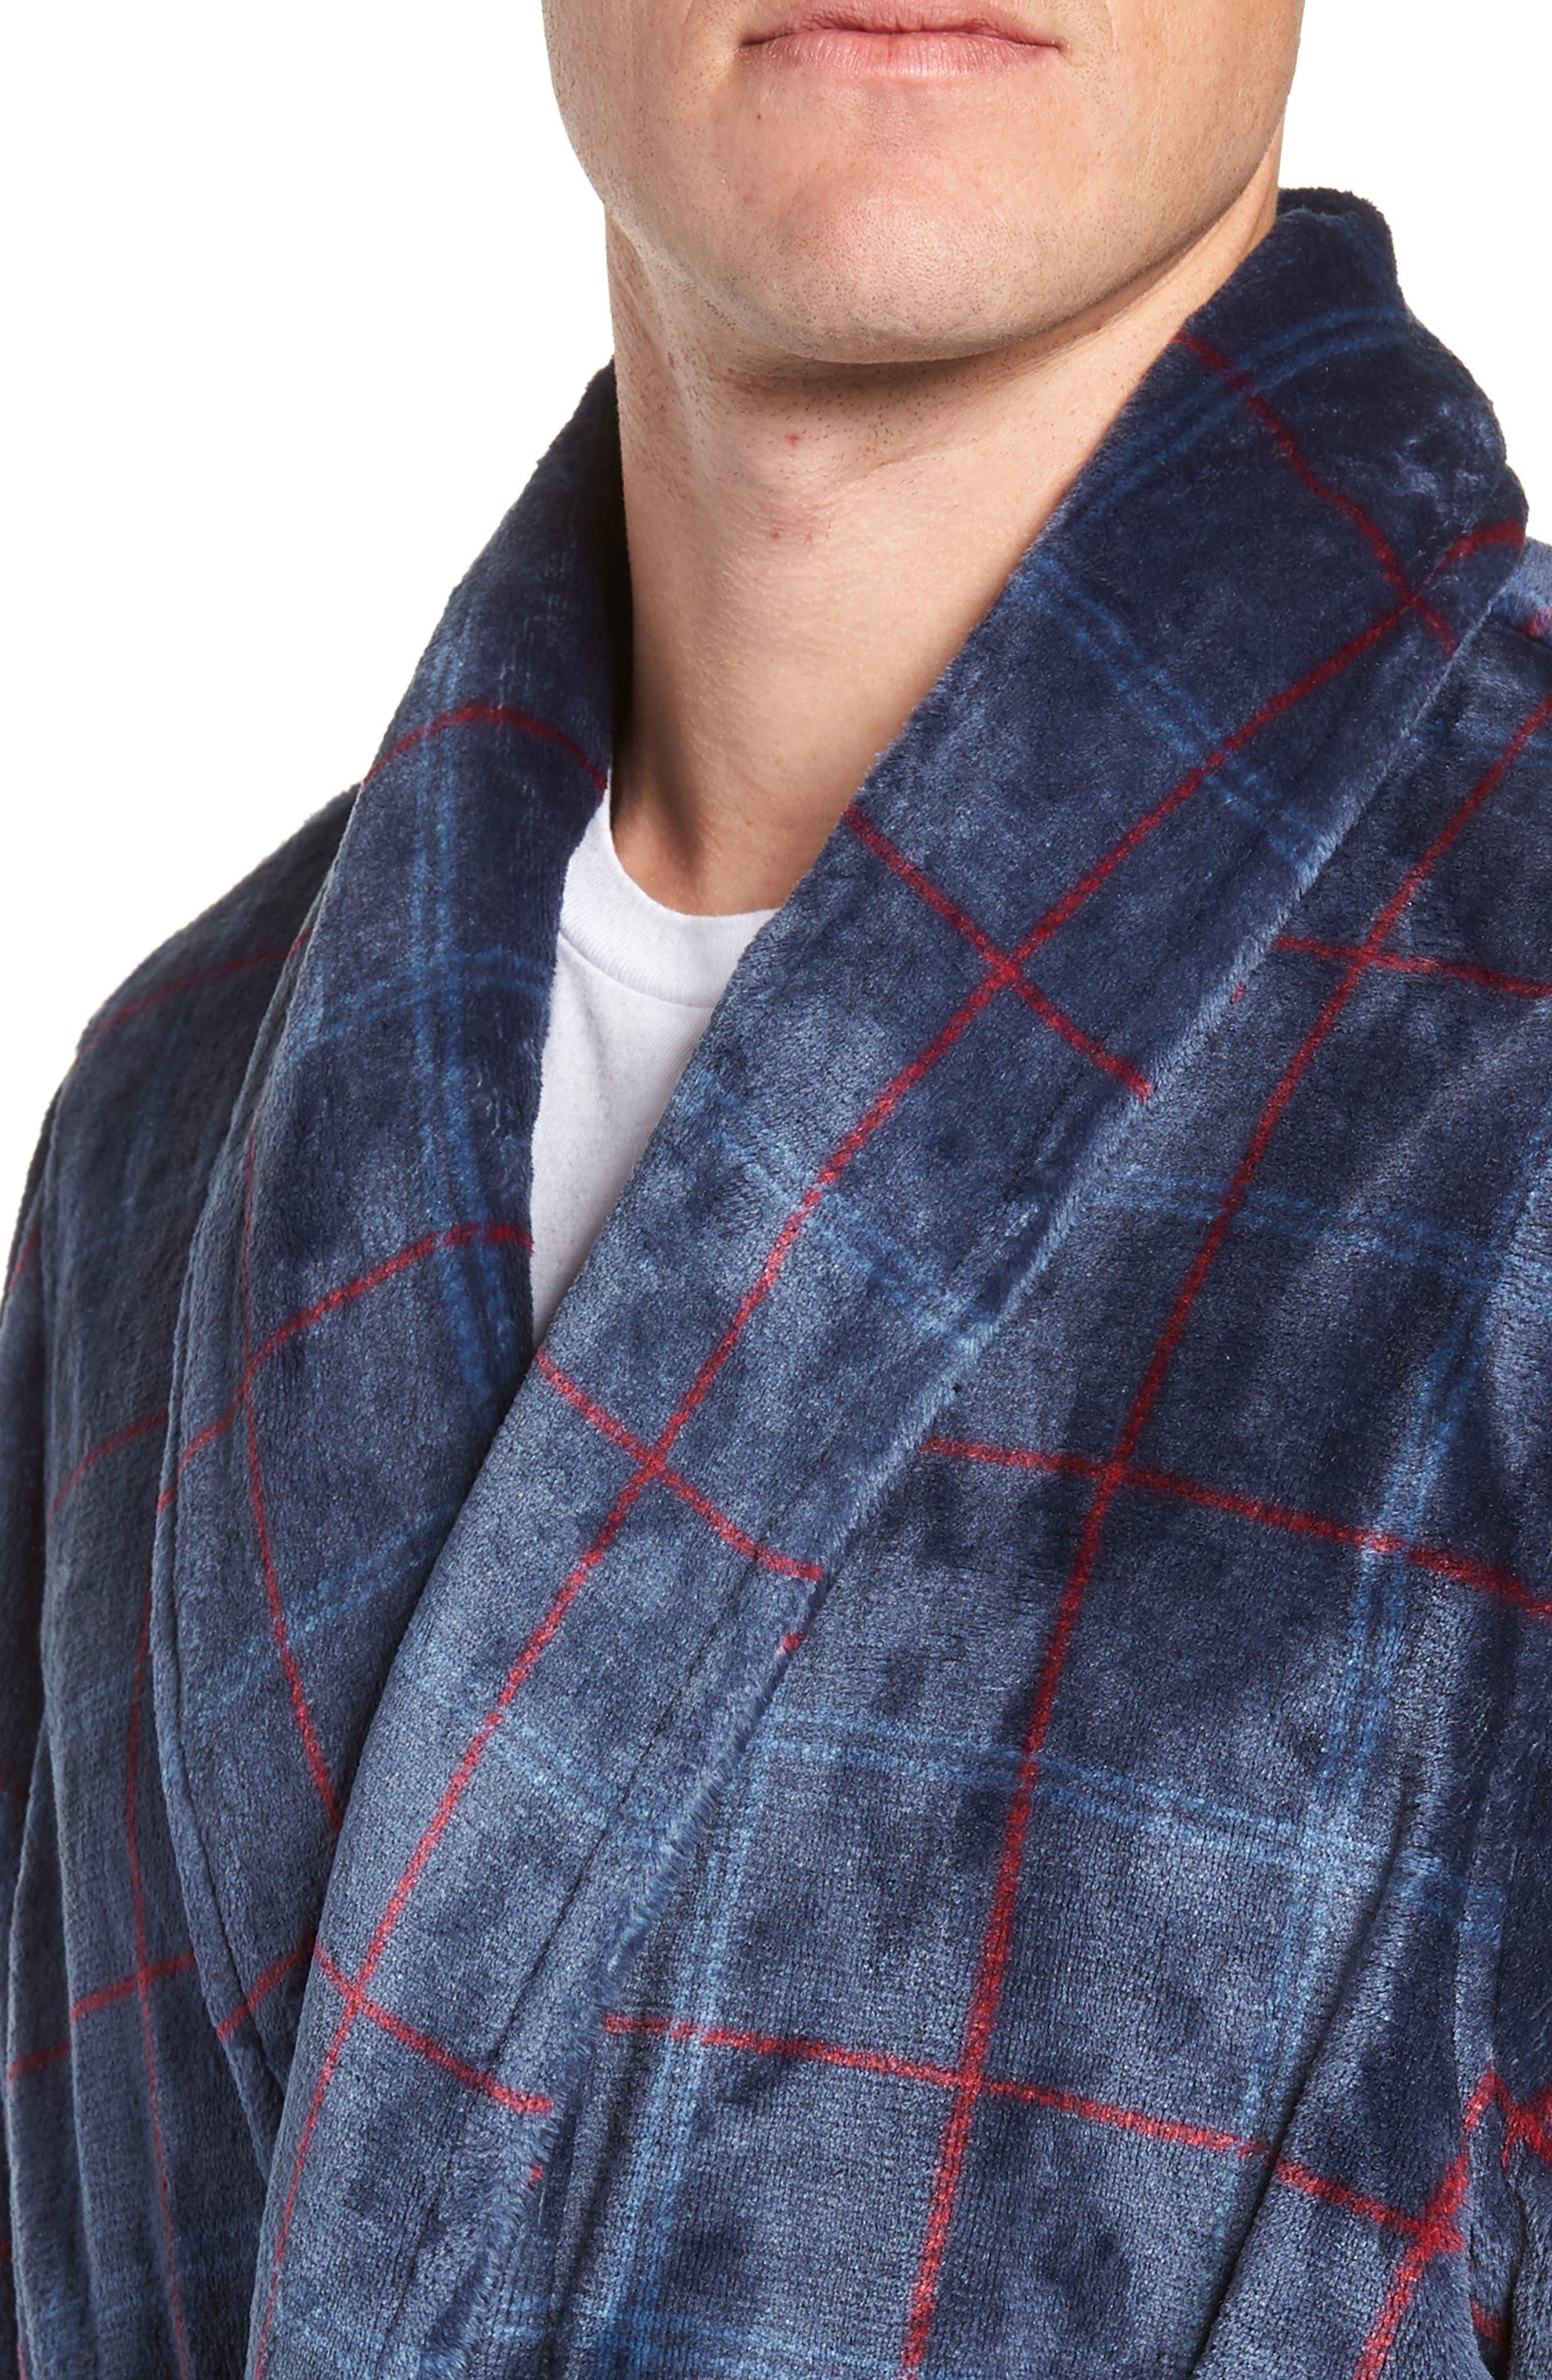 Windowpane Fleece Robe,                             Alternate thumbnail 4, color,                             NAVY -RED WINDOWPANE